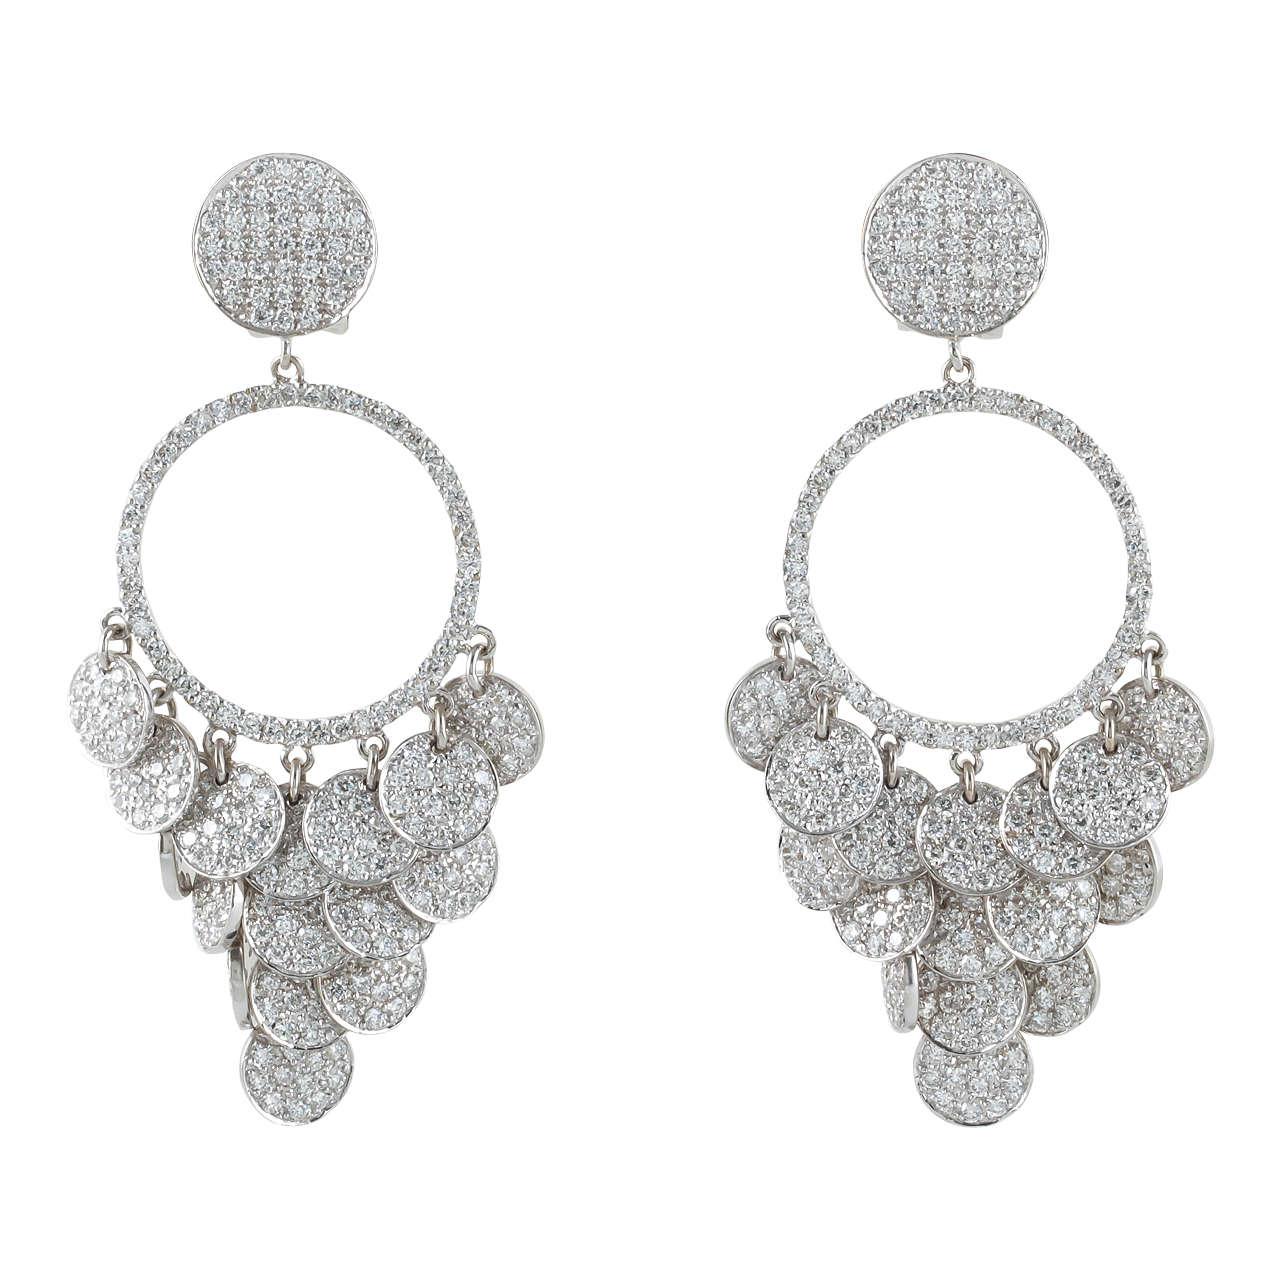 Pave diamond chandelier earrings diamond chandelier earrings pave diamond chandelier earrings arubaitofo Choice Image